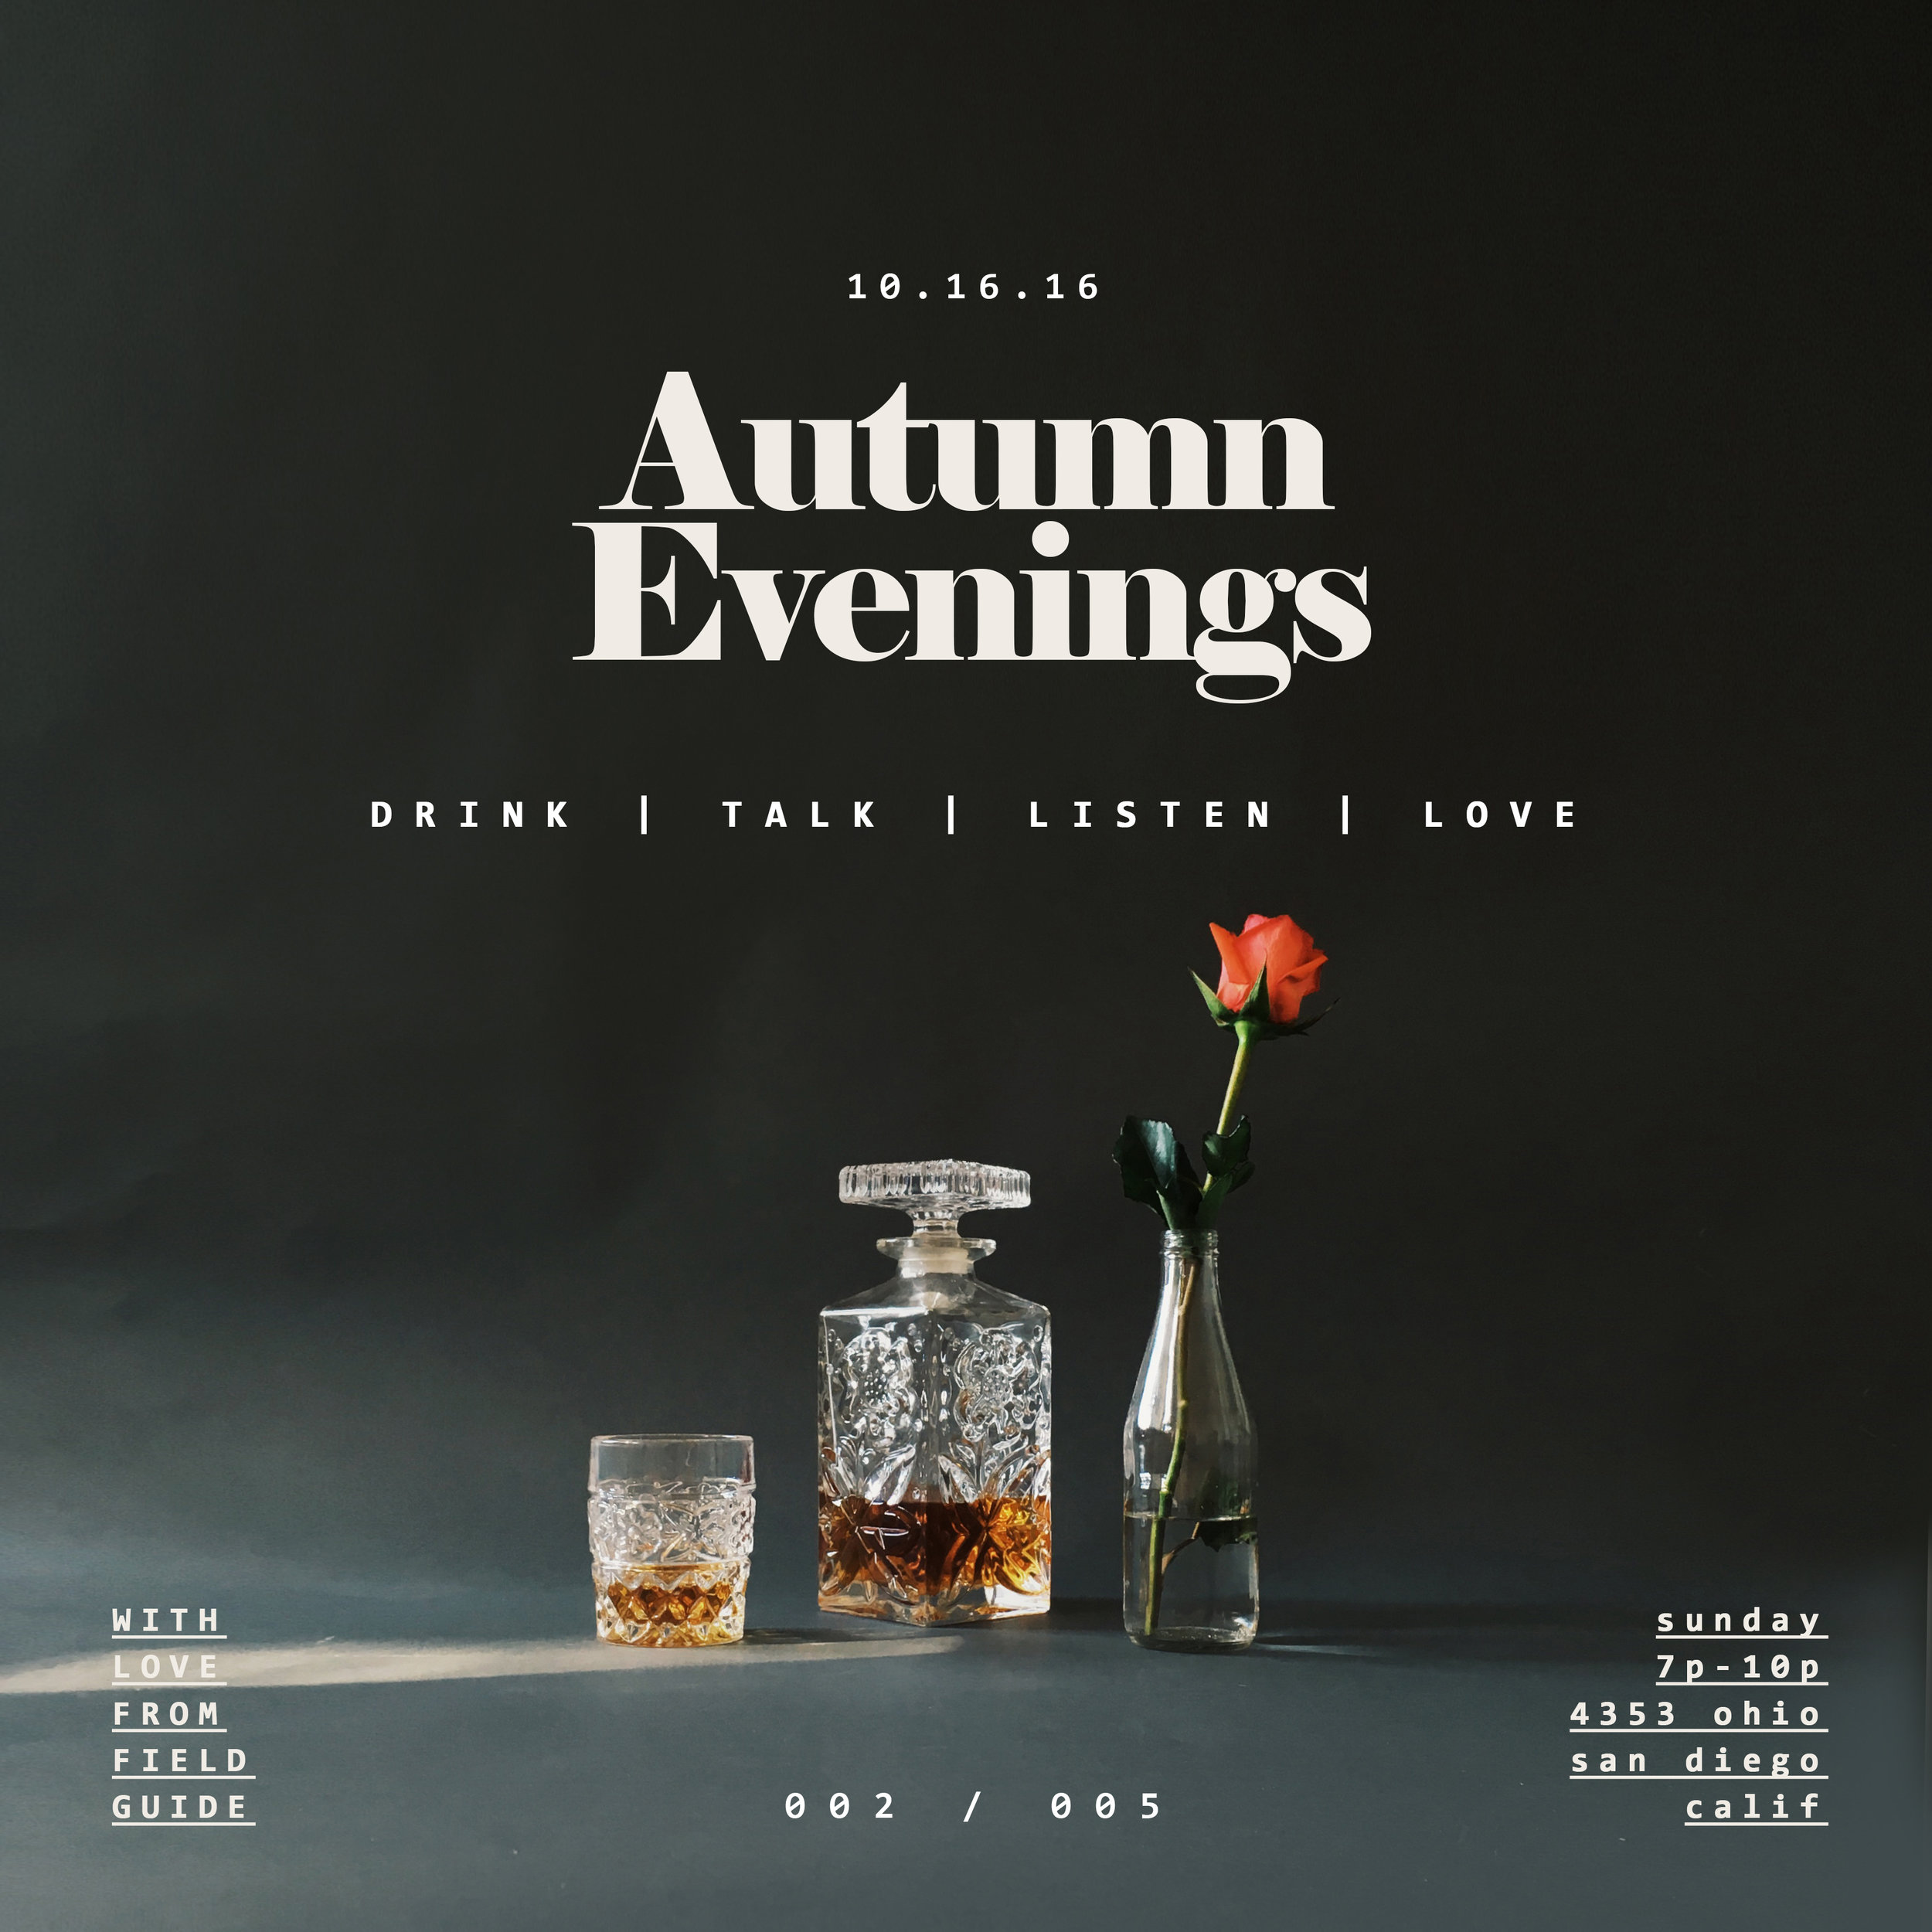 autumn evenings 002.jpg